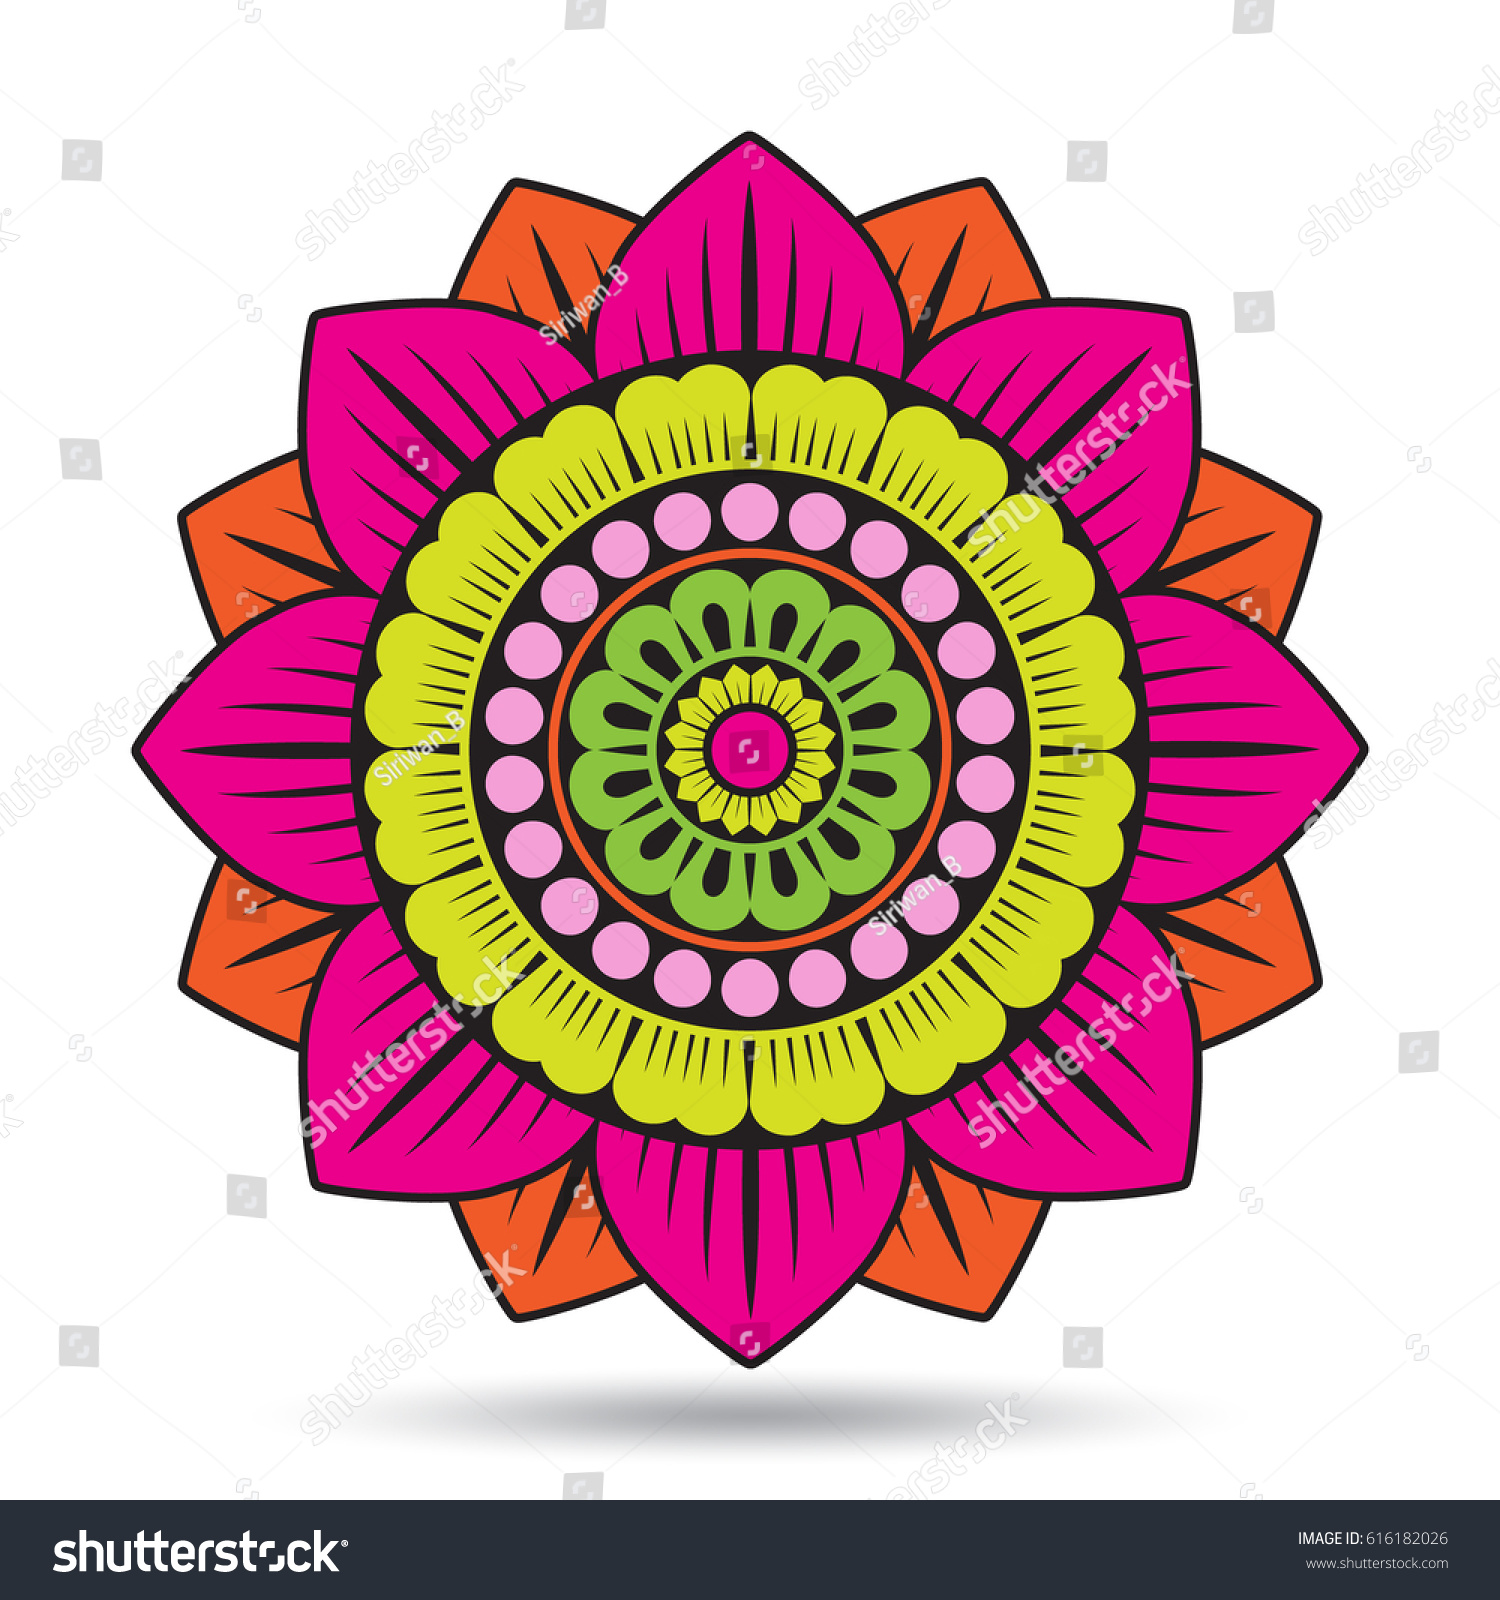 Lotus flower elements oriental ornament graphic stock vector 2018 lotus flower elements oriental ornament graphic vector illustration izmirmasajfo